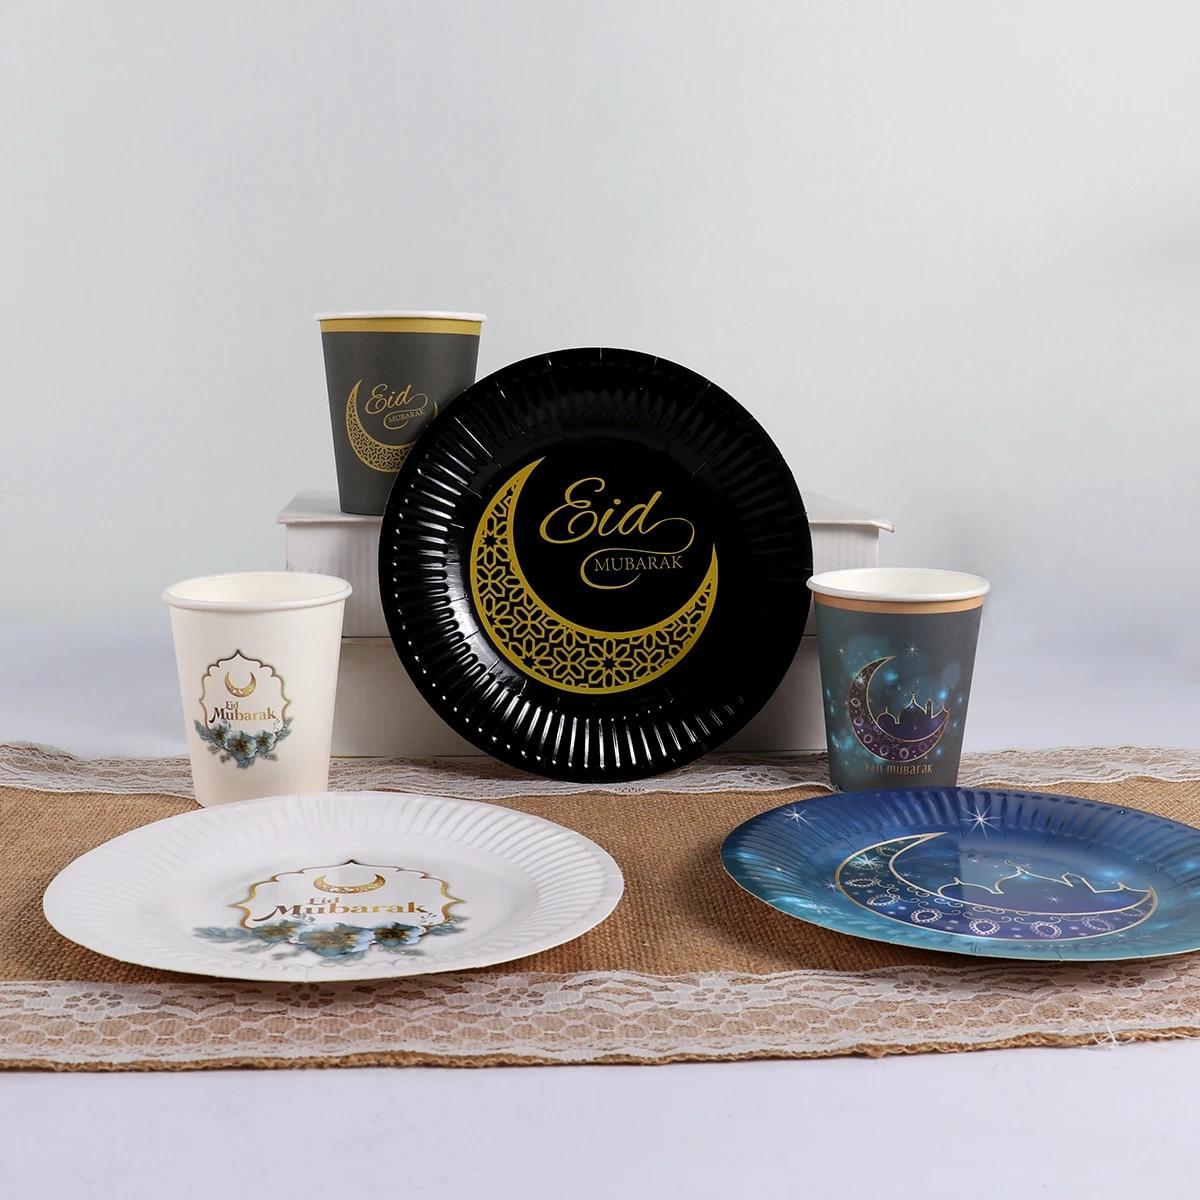 Eid Al Fitr Wegwerp Servies Papier Cup Plaat Ramadan Kareem Decoratie Eid Mubarak Moslim Islamitische Festival Party Diy Decor Party Diy Decorations Aliexpress